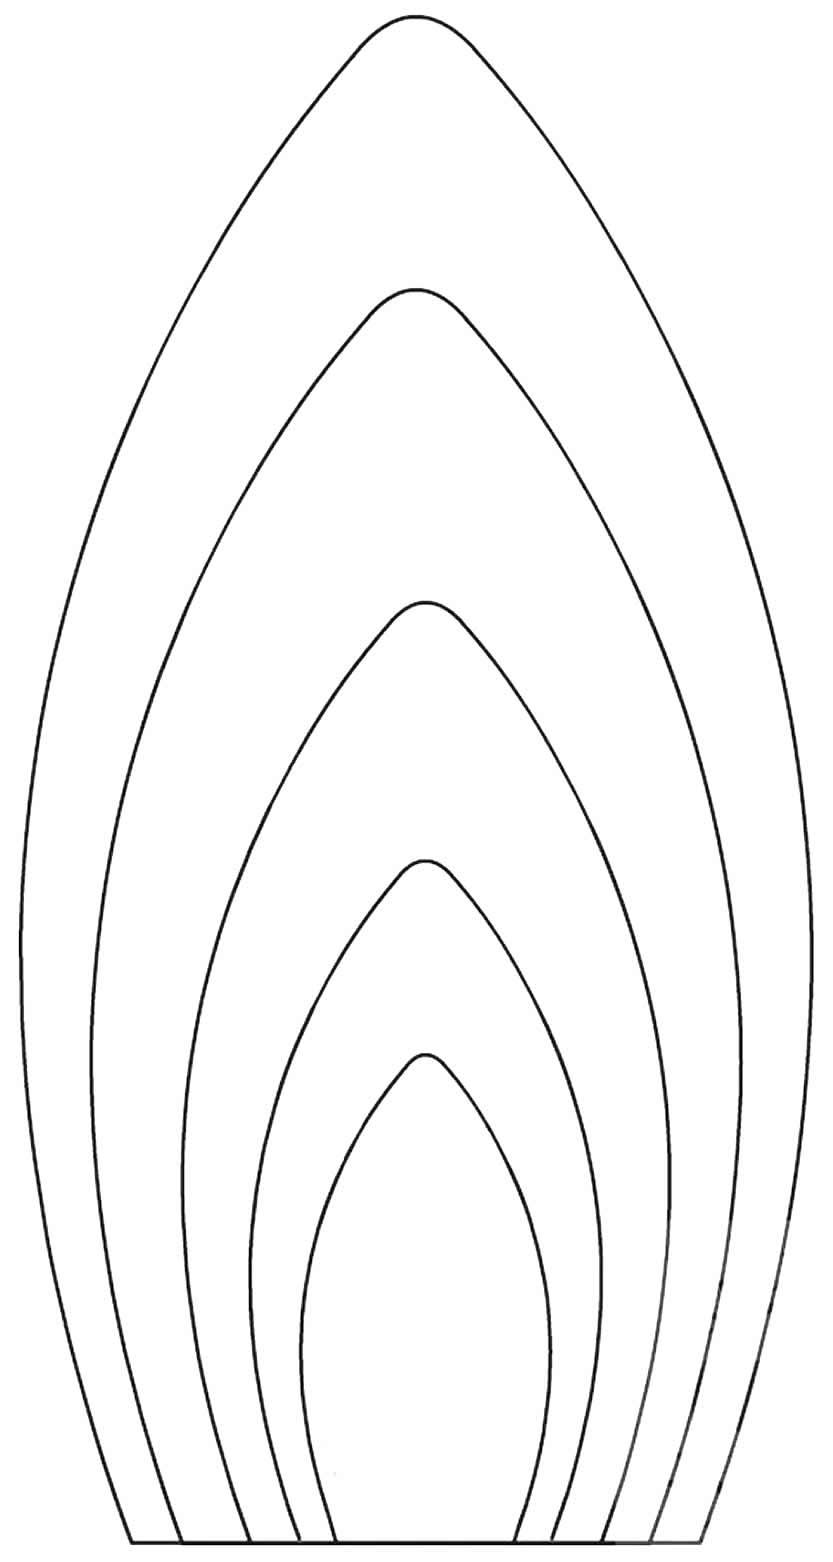 Modelos de pétalas de flor